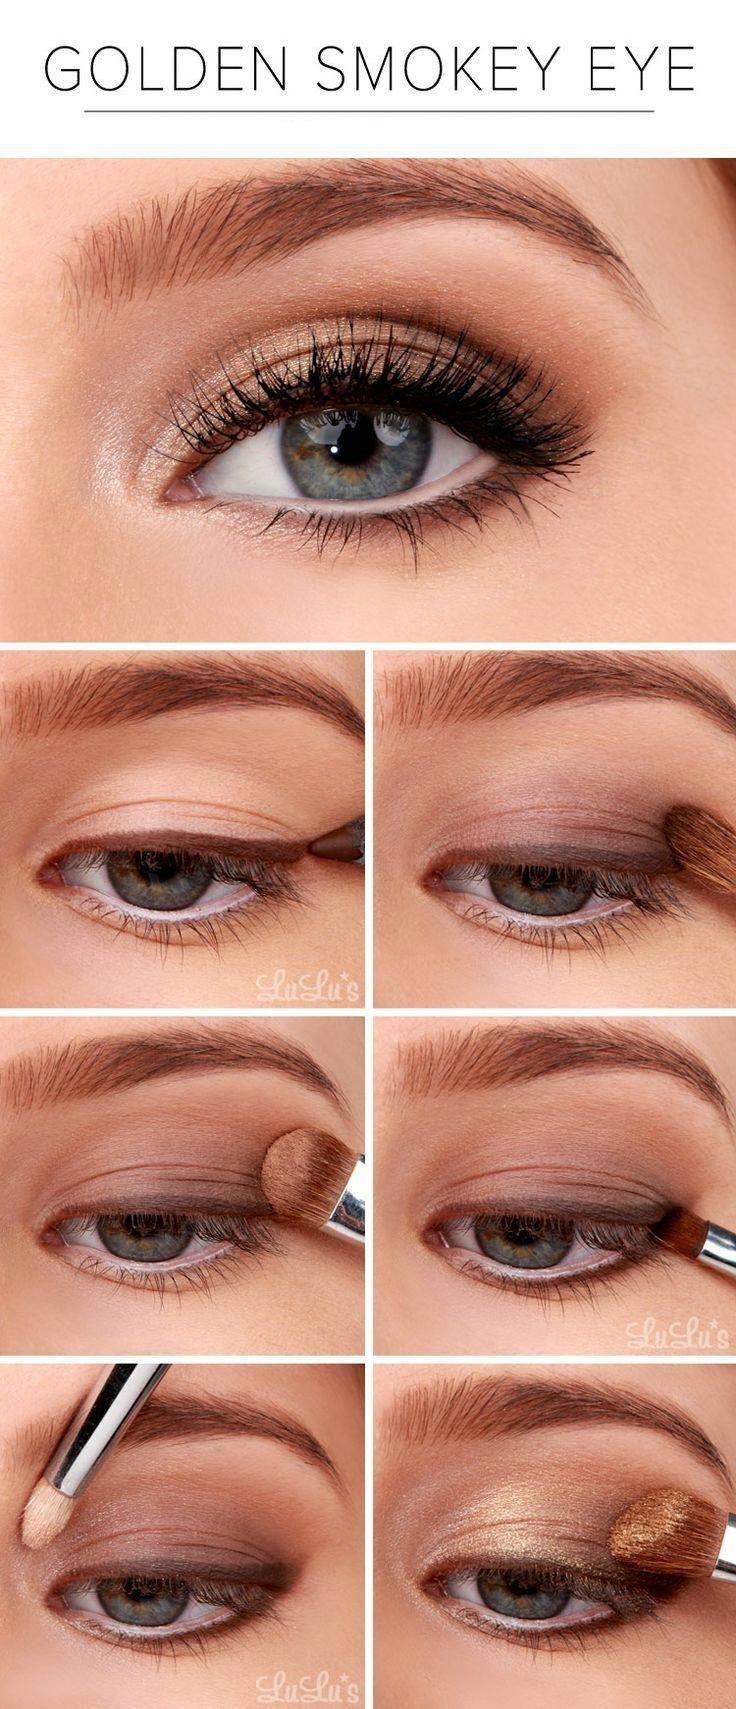 10 makeup precious hacks for hooded eyes